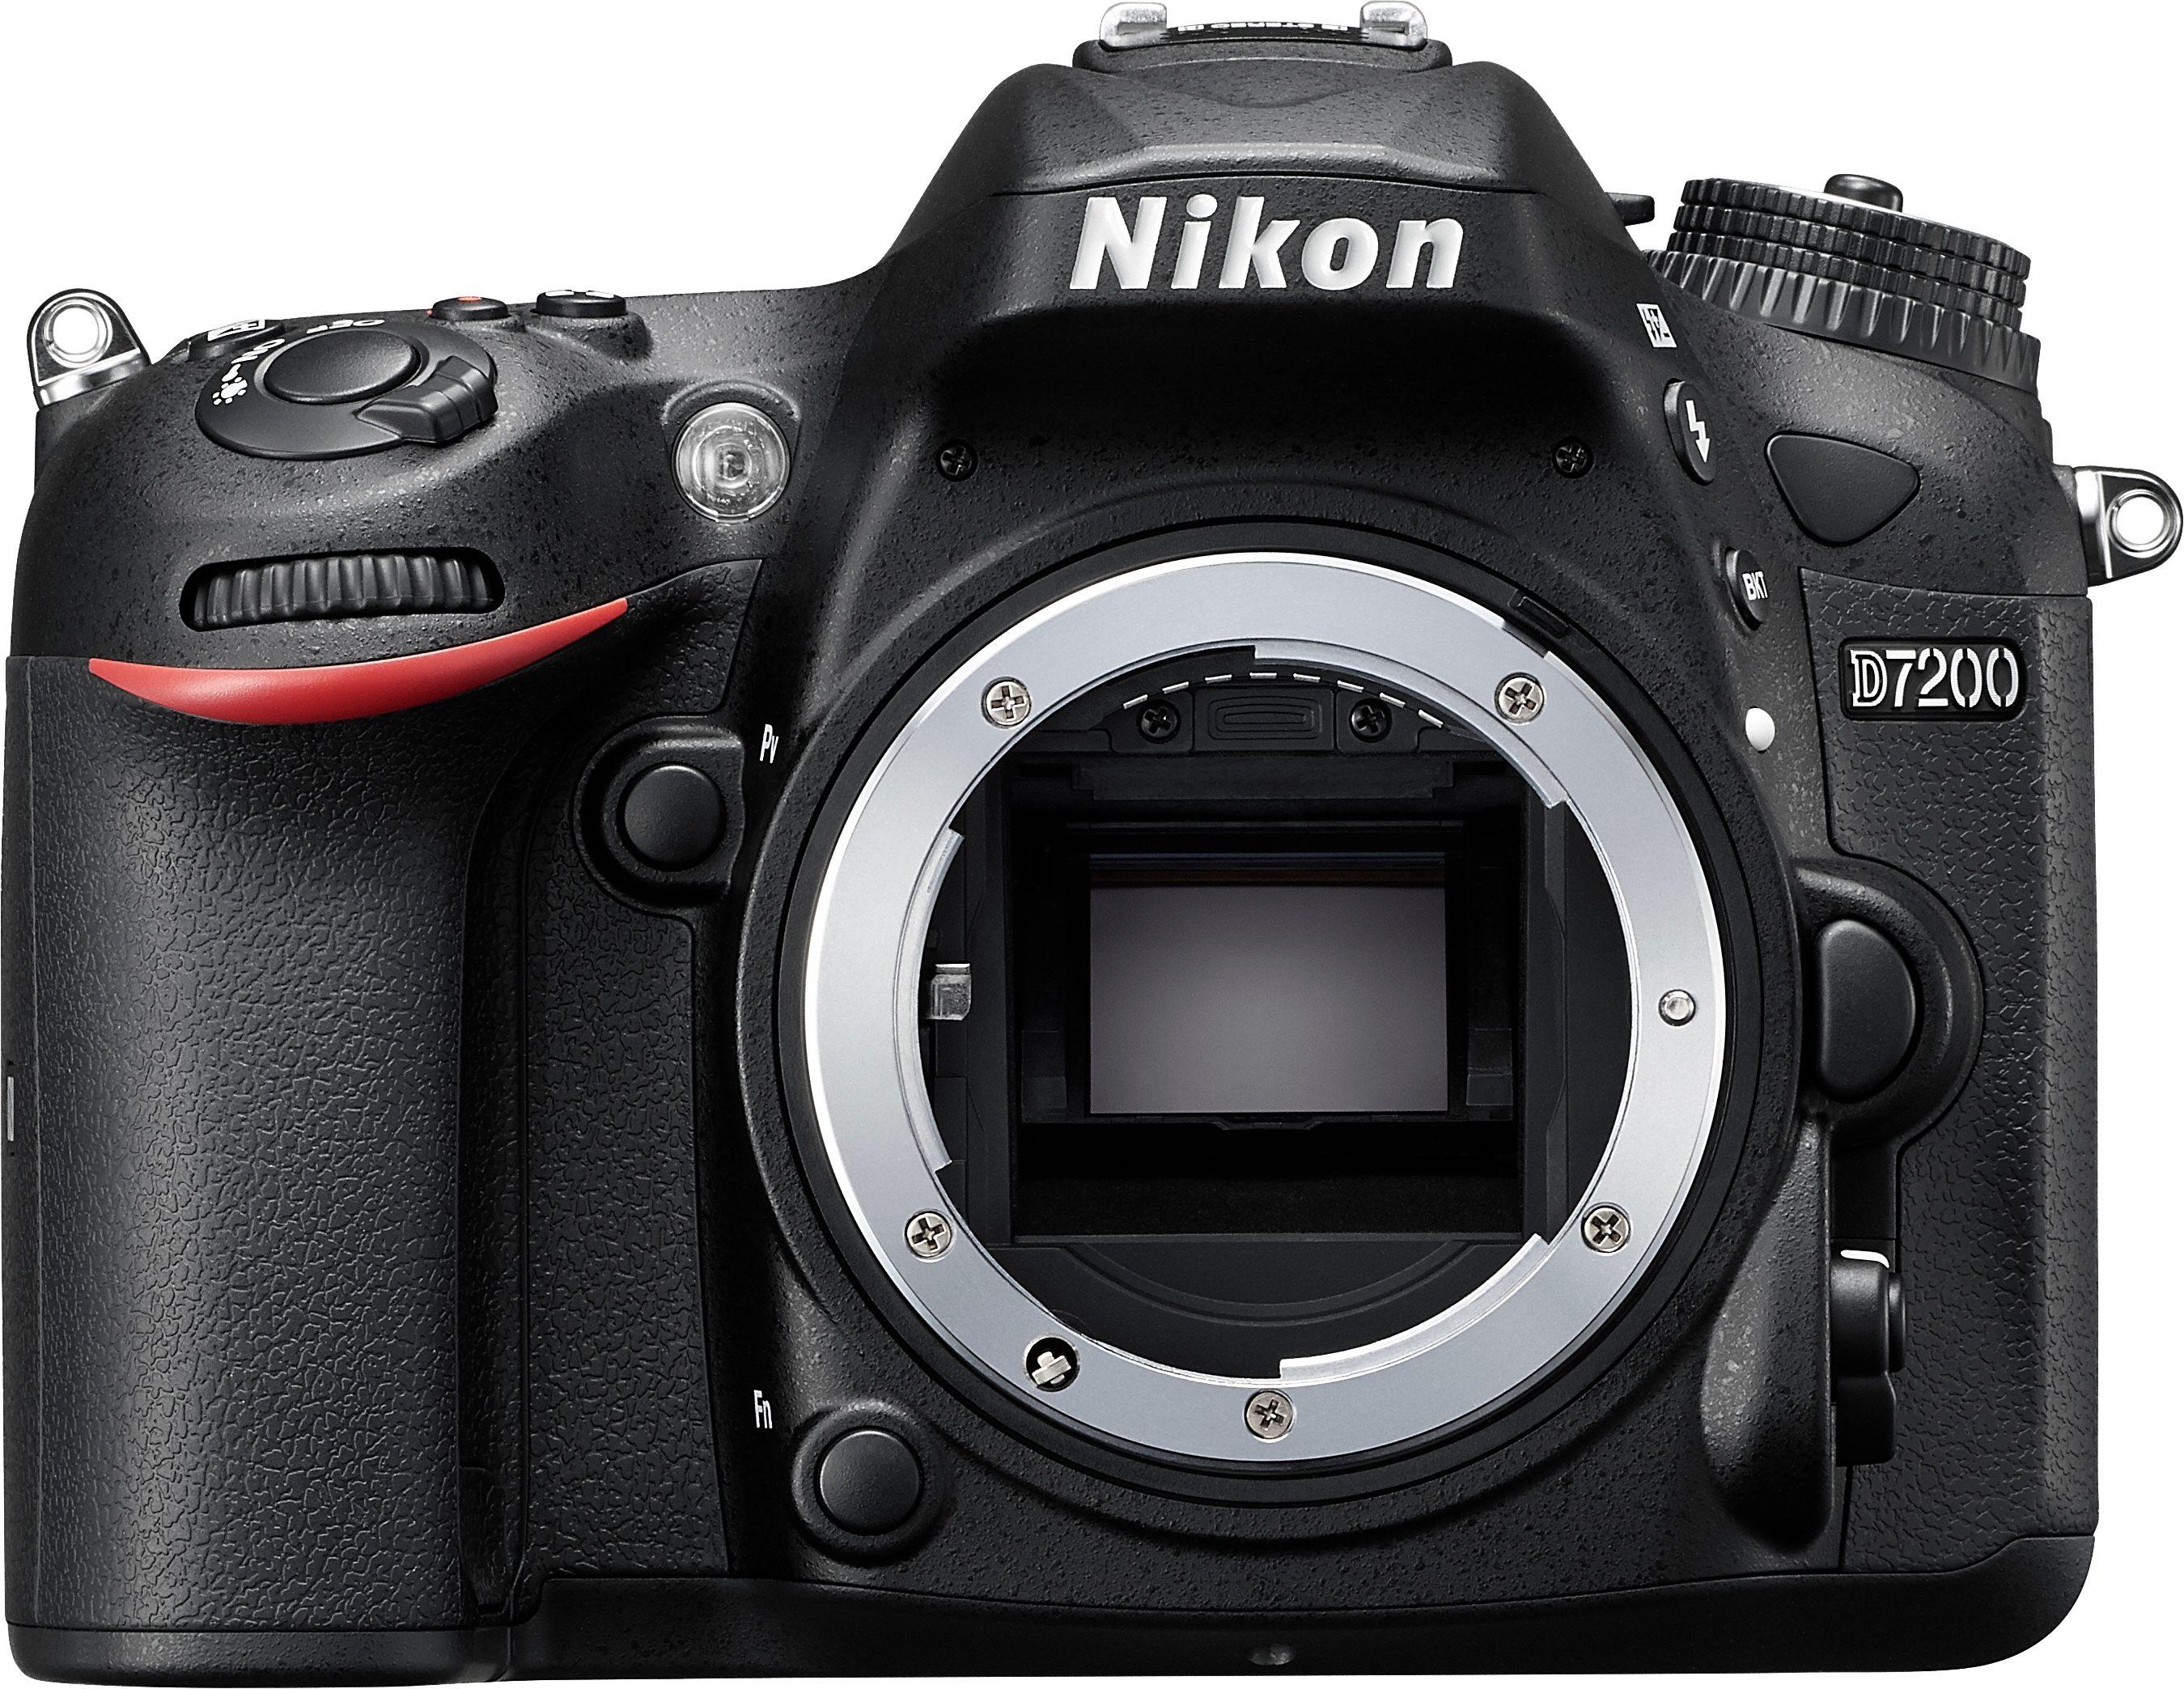 Nikon D7200 Body Spiegelreflex Kamera, 24,2 Megapixel, 8 cm (3,2 Zoll) Display